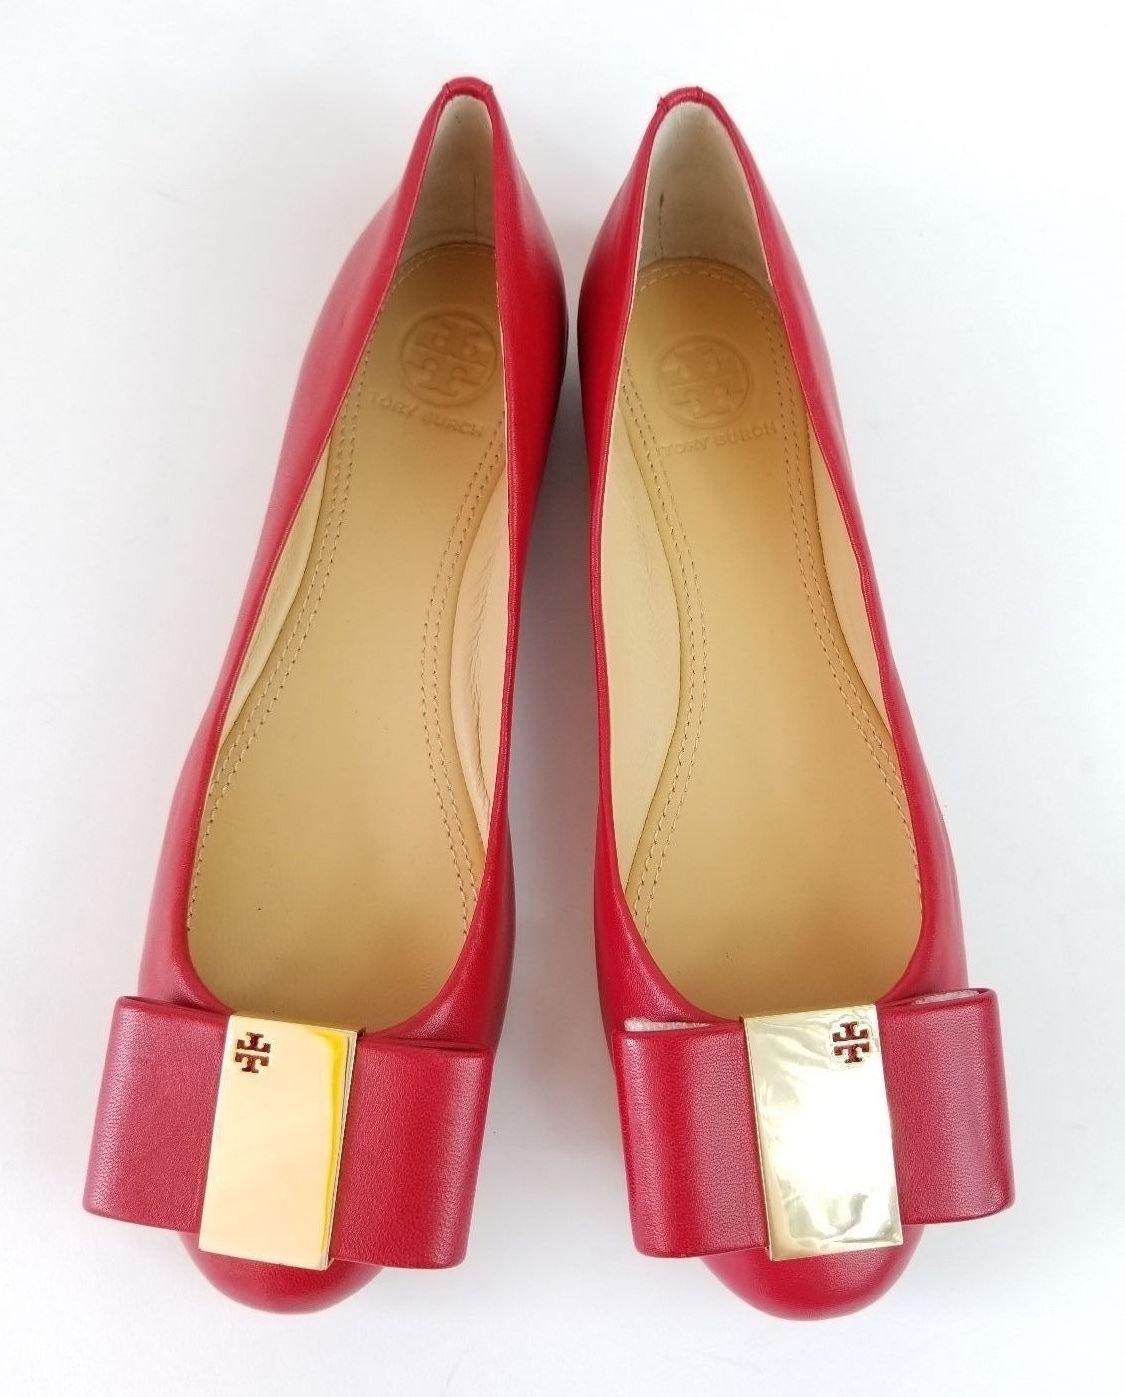 Tory Burch Chase Ballet Flat Matte Glove Nappa Brand NEW in box